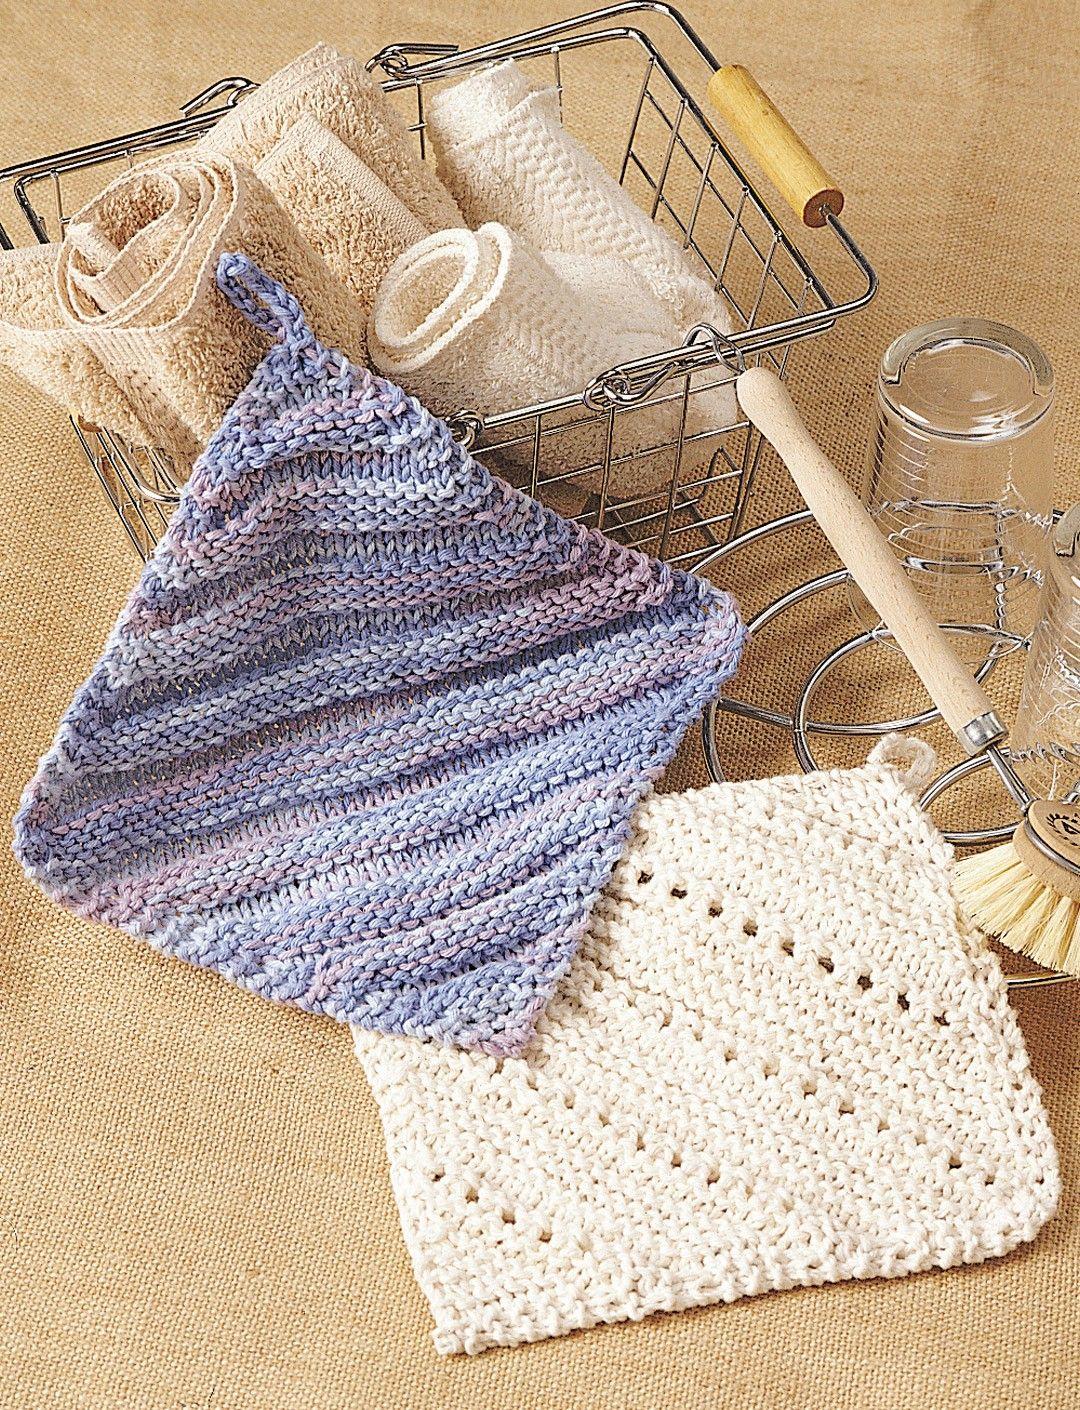 Yarnspirations.com - Lily Simple Ridge & Eyelet Dishcloth ...